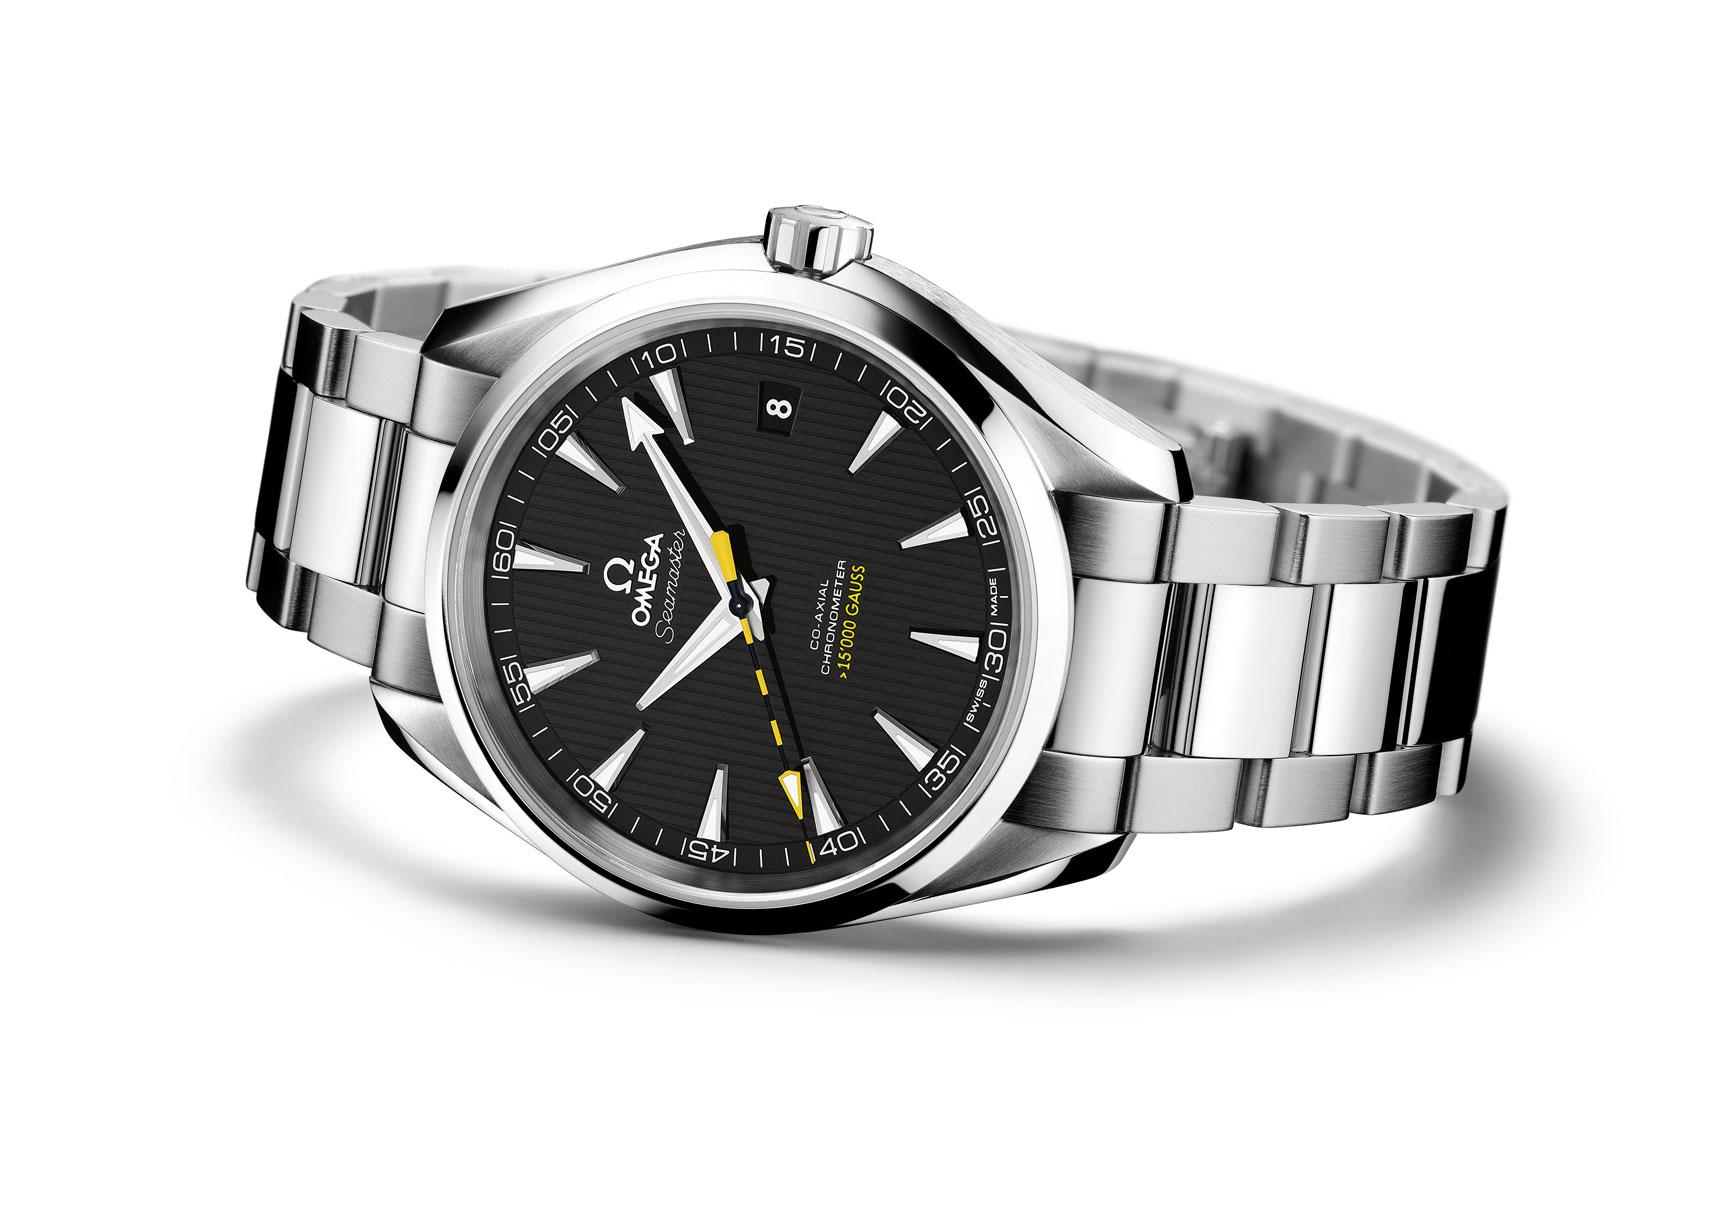 wrist watch top 10 technically important mechanical wrist watches abtw editorsu0027 lists ynzefwr